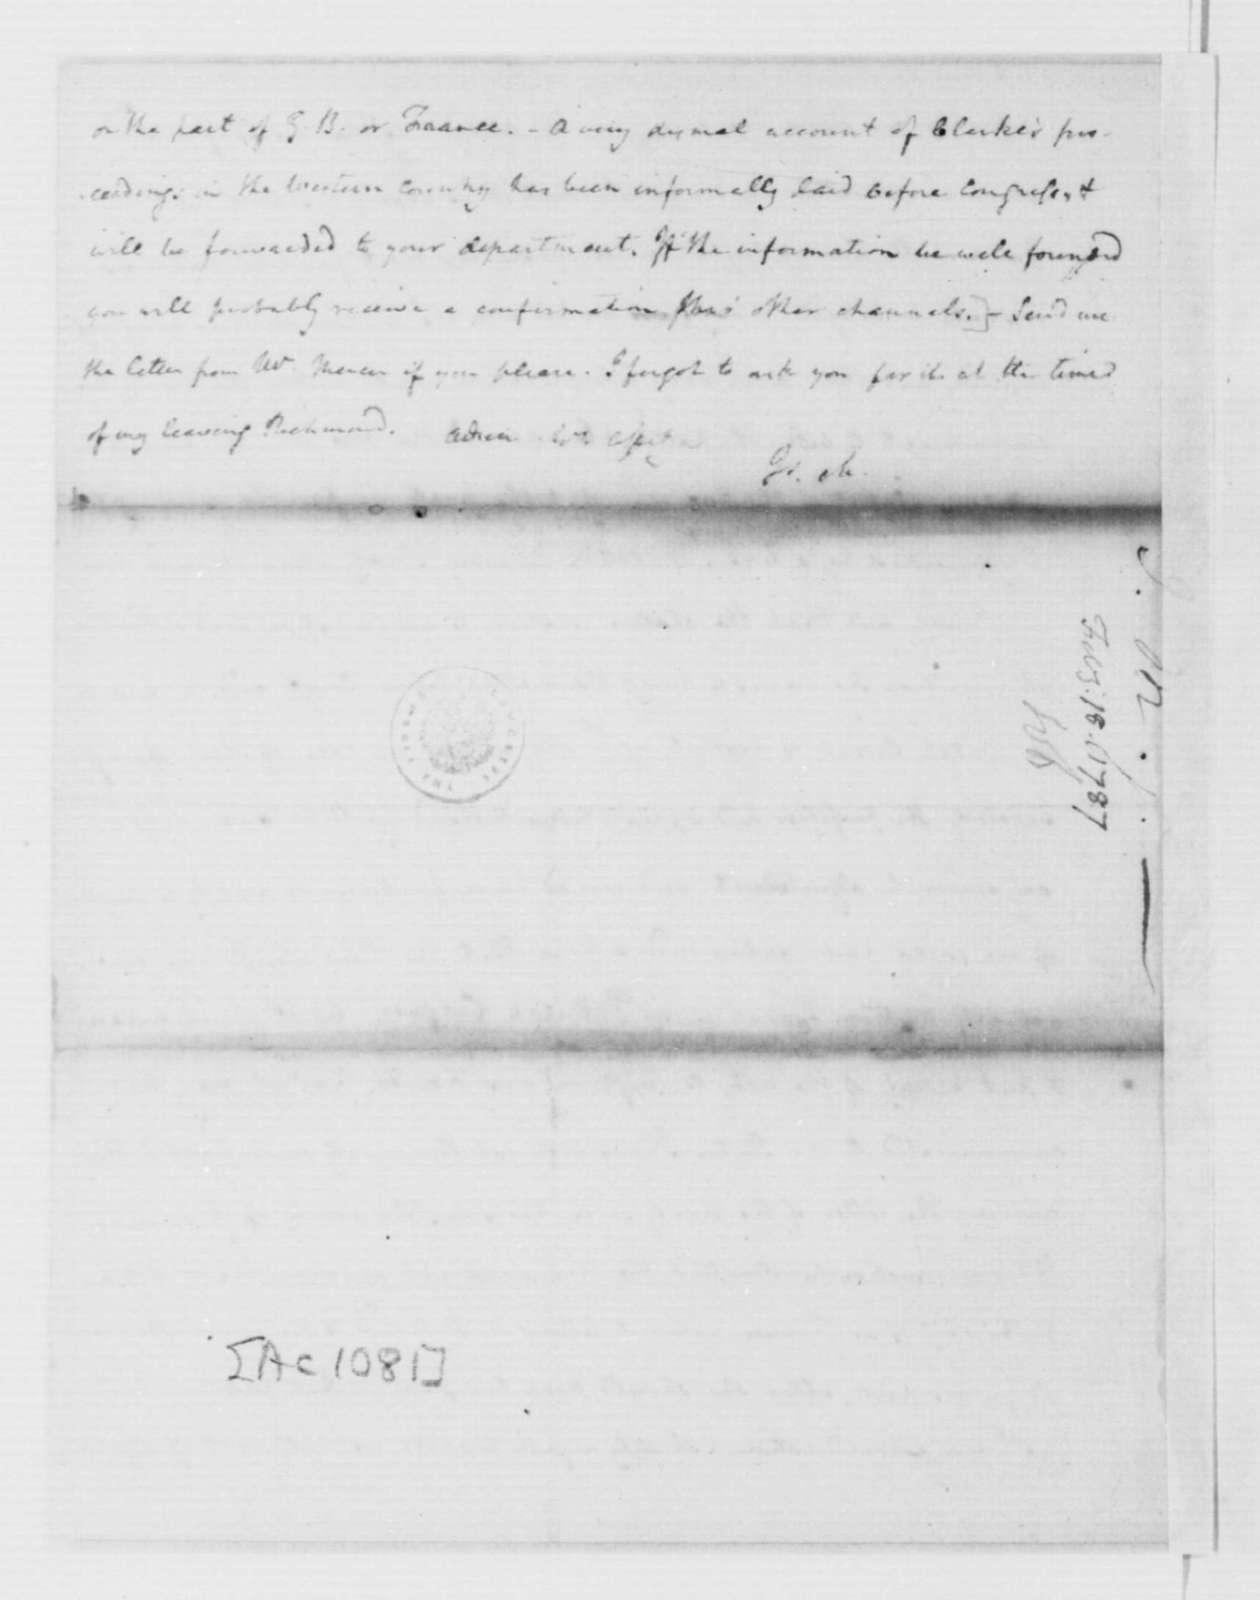 James Madison to Edmund Randolph, February 18, 1787.